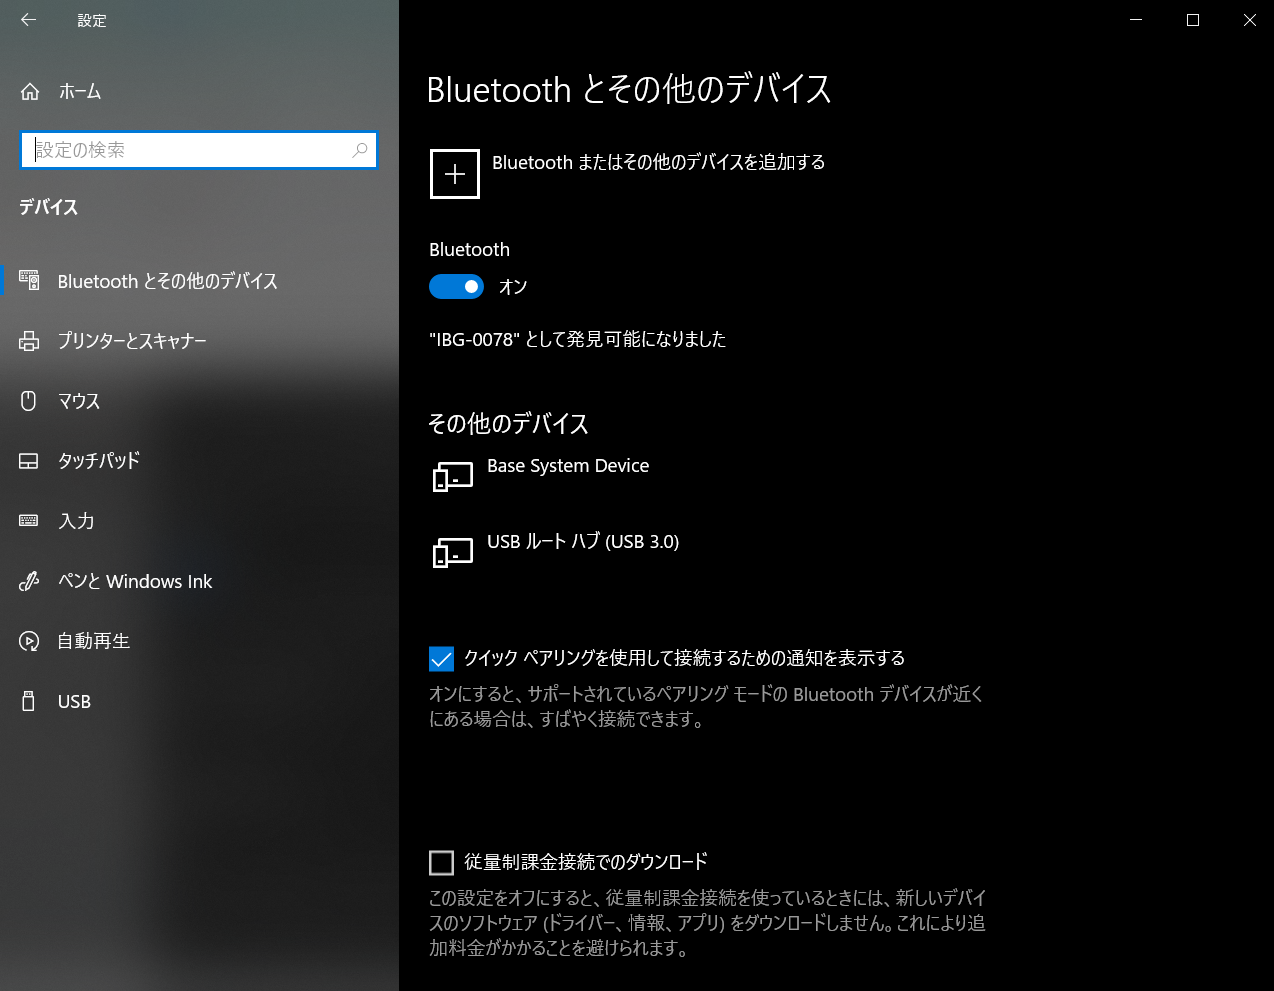 Windows 10のデバイス設定画面